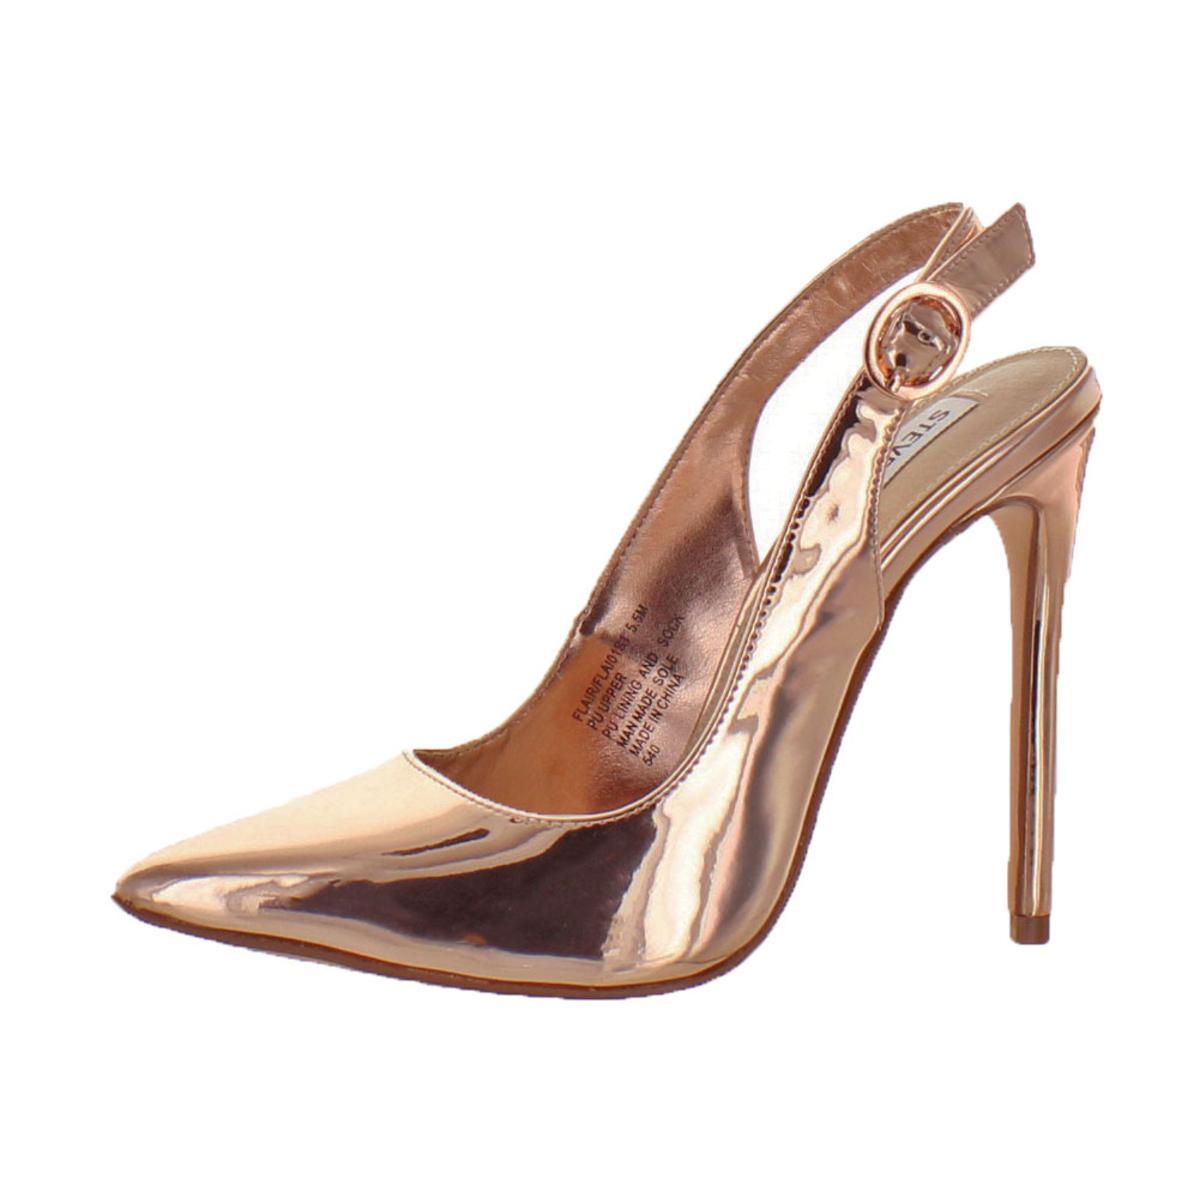 Steve Madden Damenschuhe Flair Pink Slingback Schuhes Heels Schuhes Slingback 5.5 Medium (B,M ... 5ae8bc